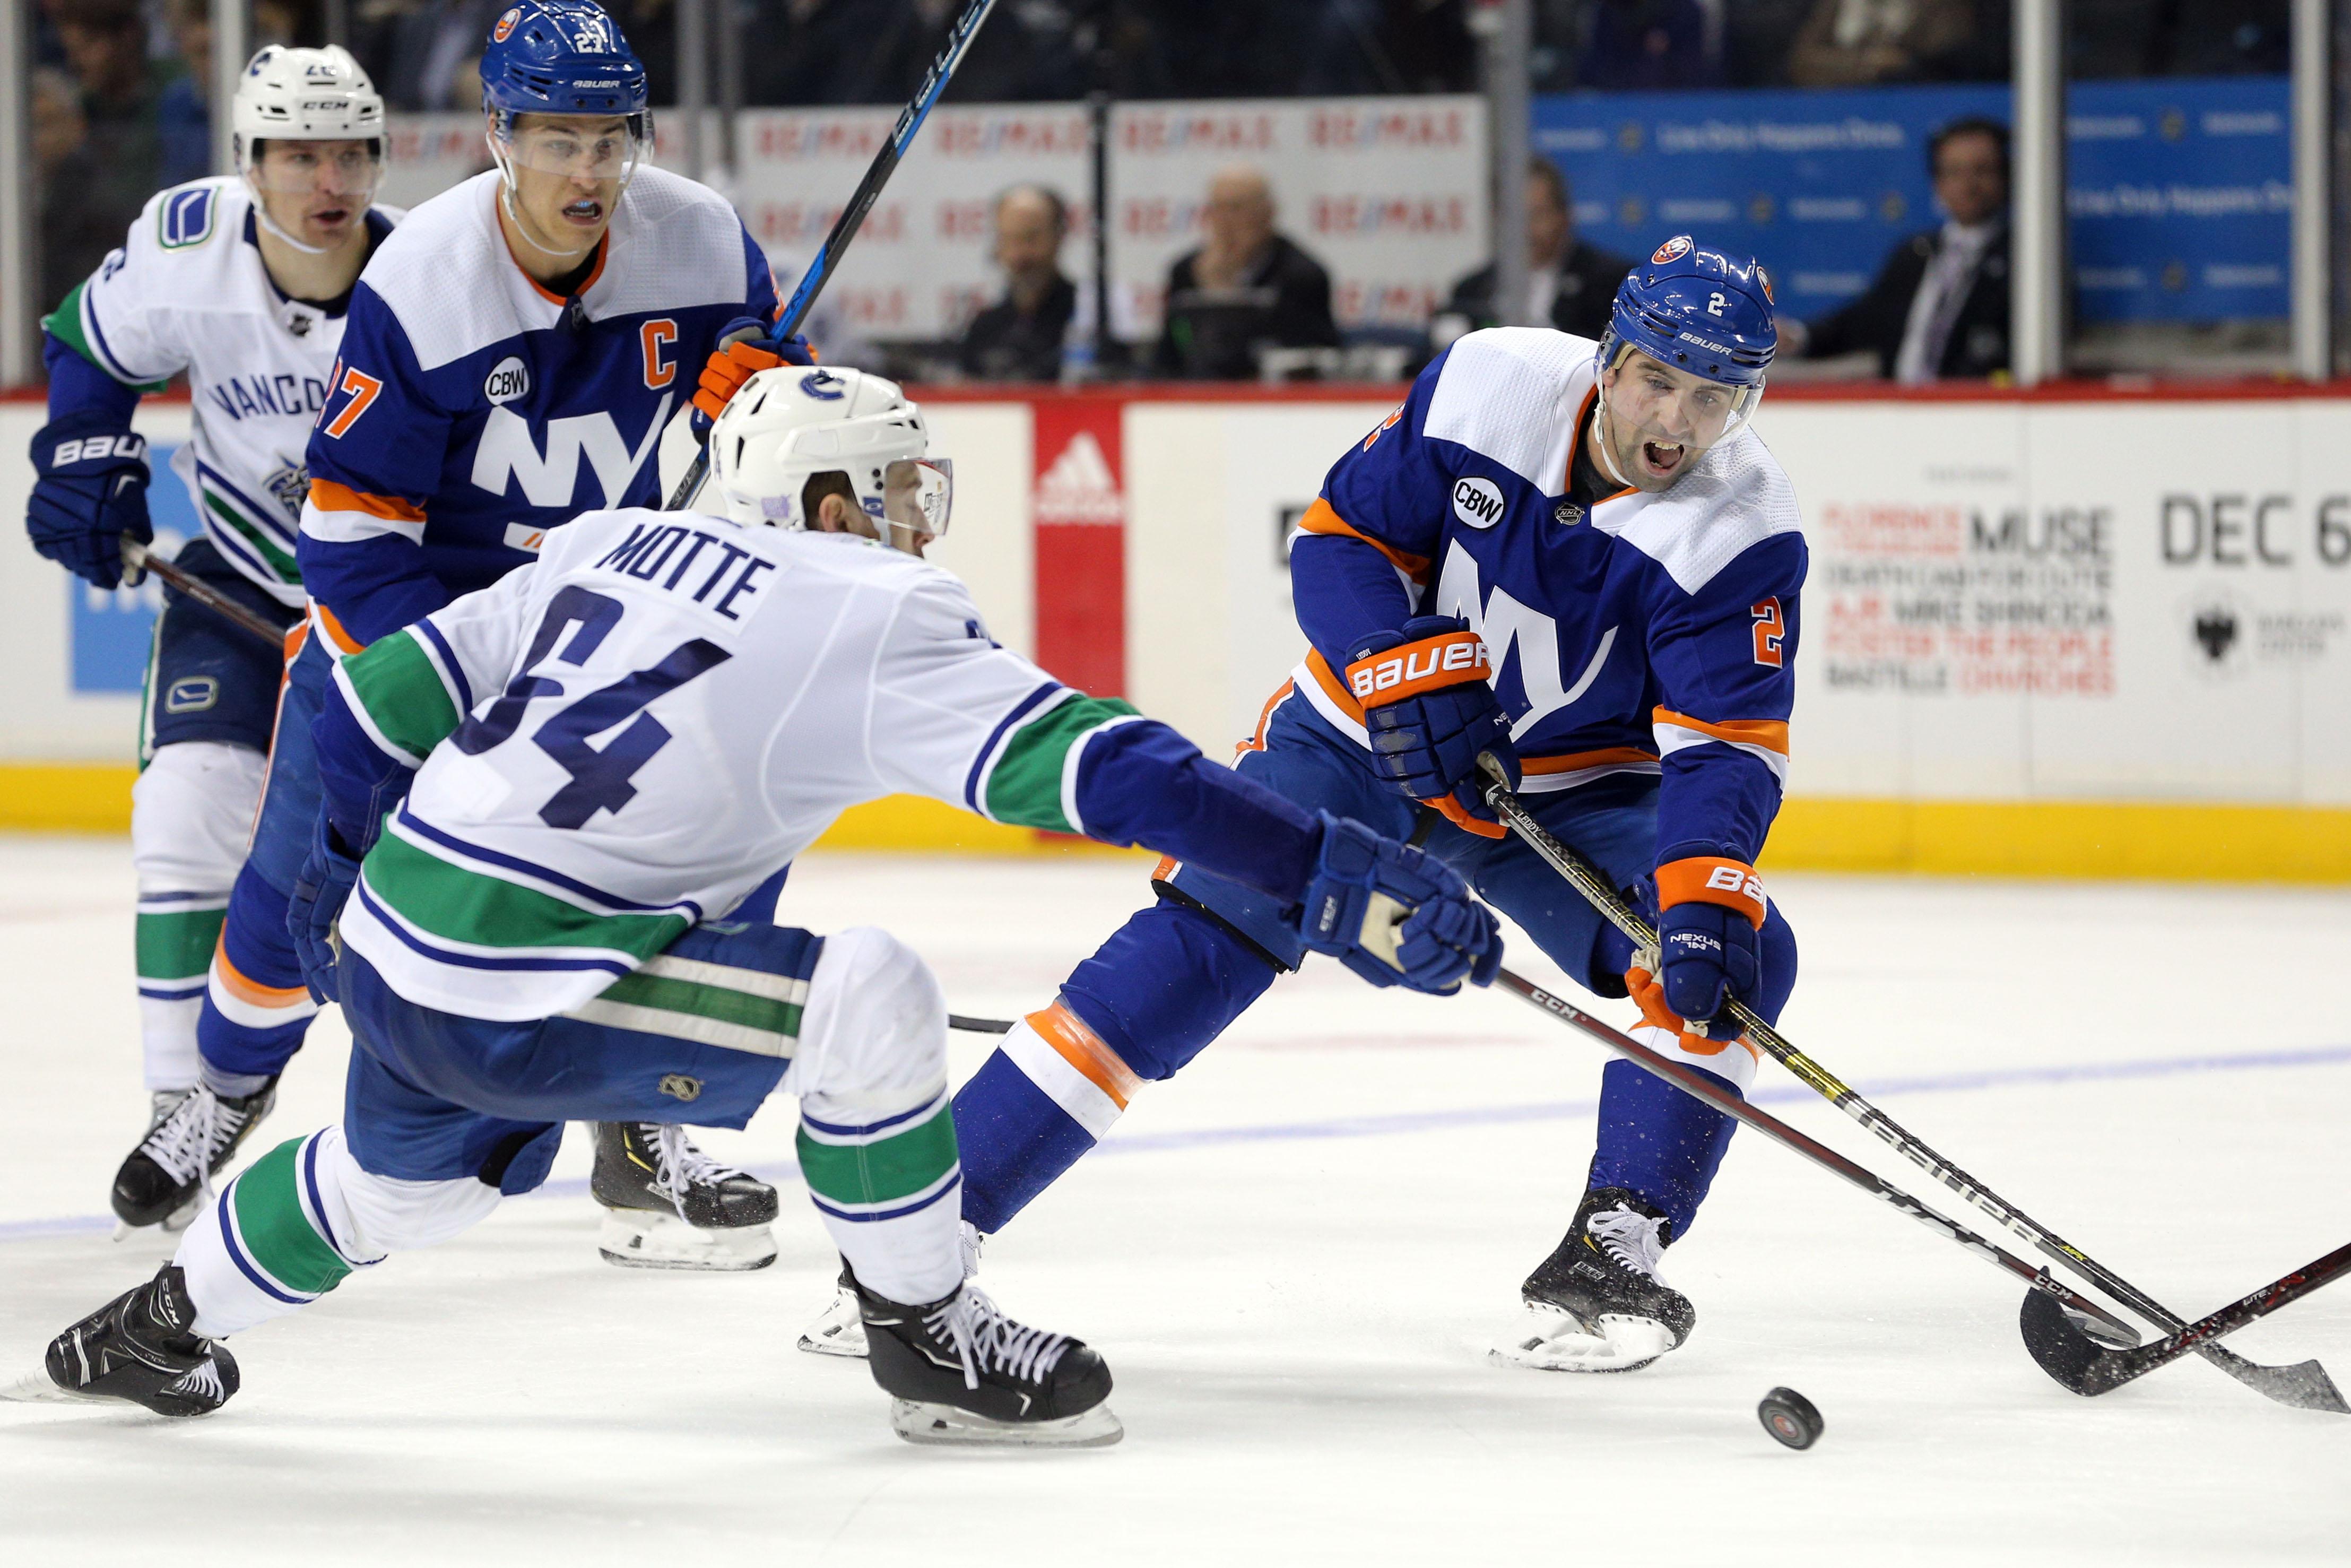 Islanders snap skid in 5-2 win over Canucks